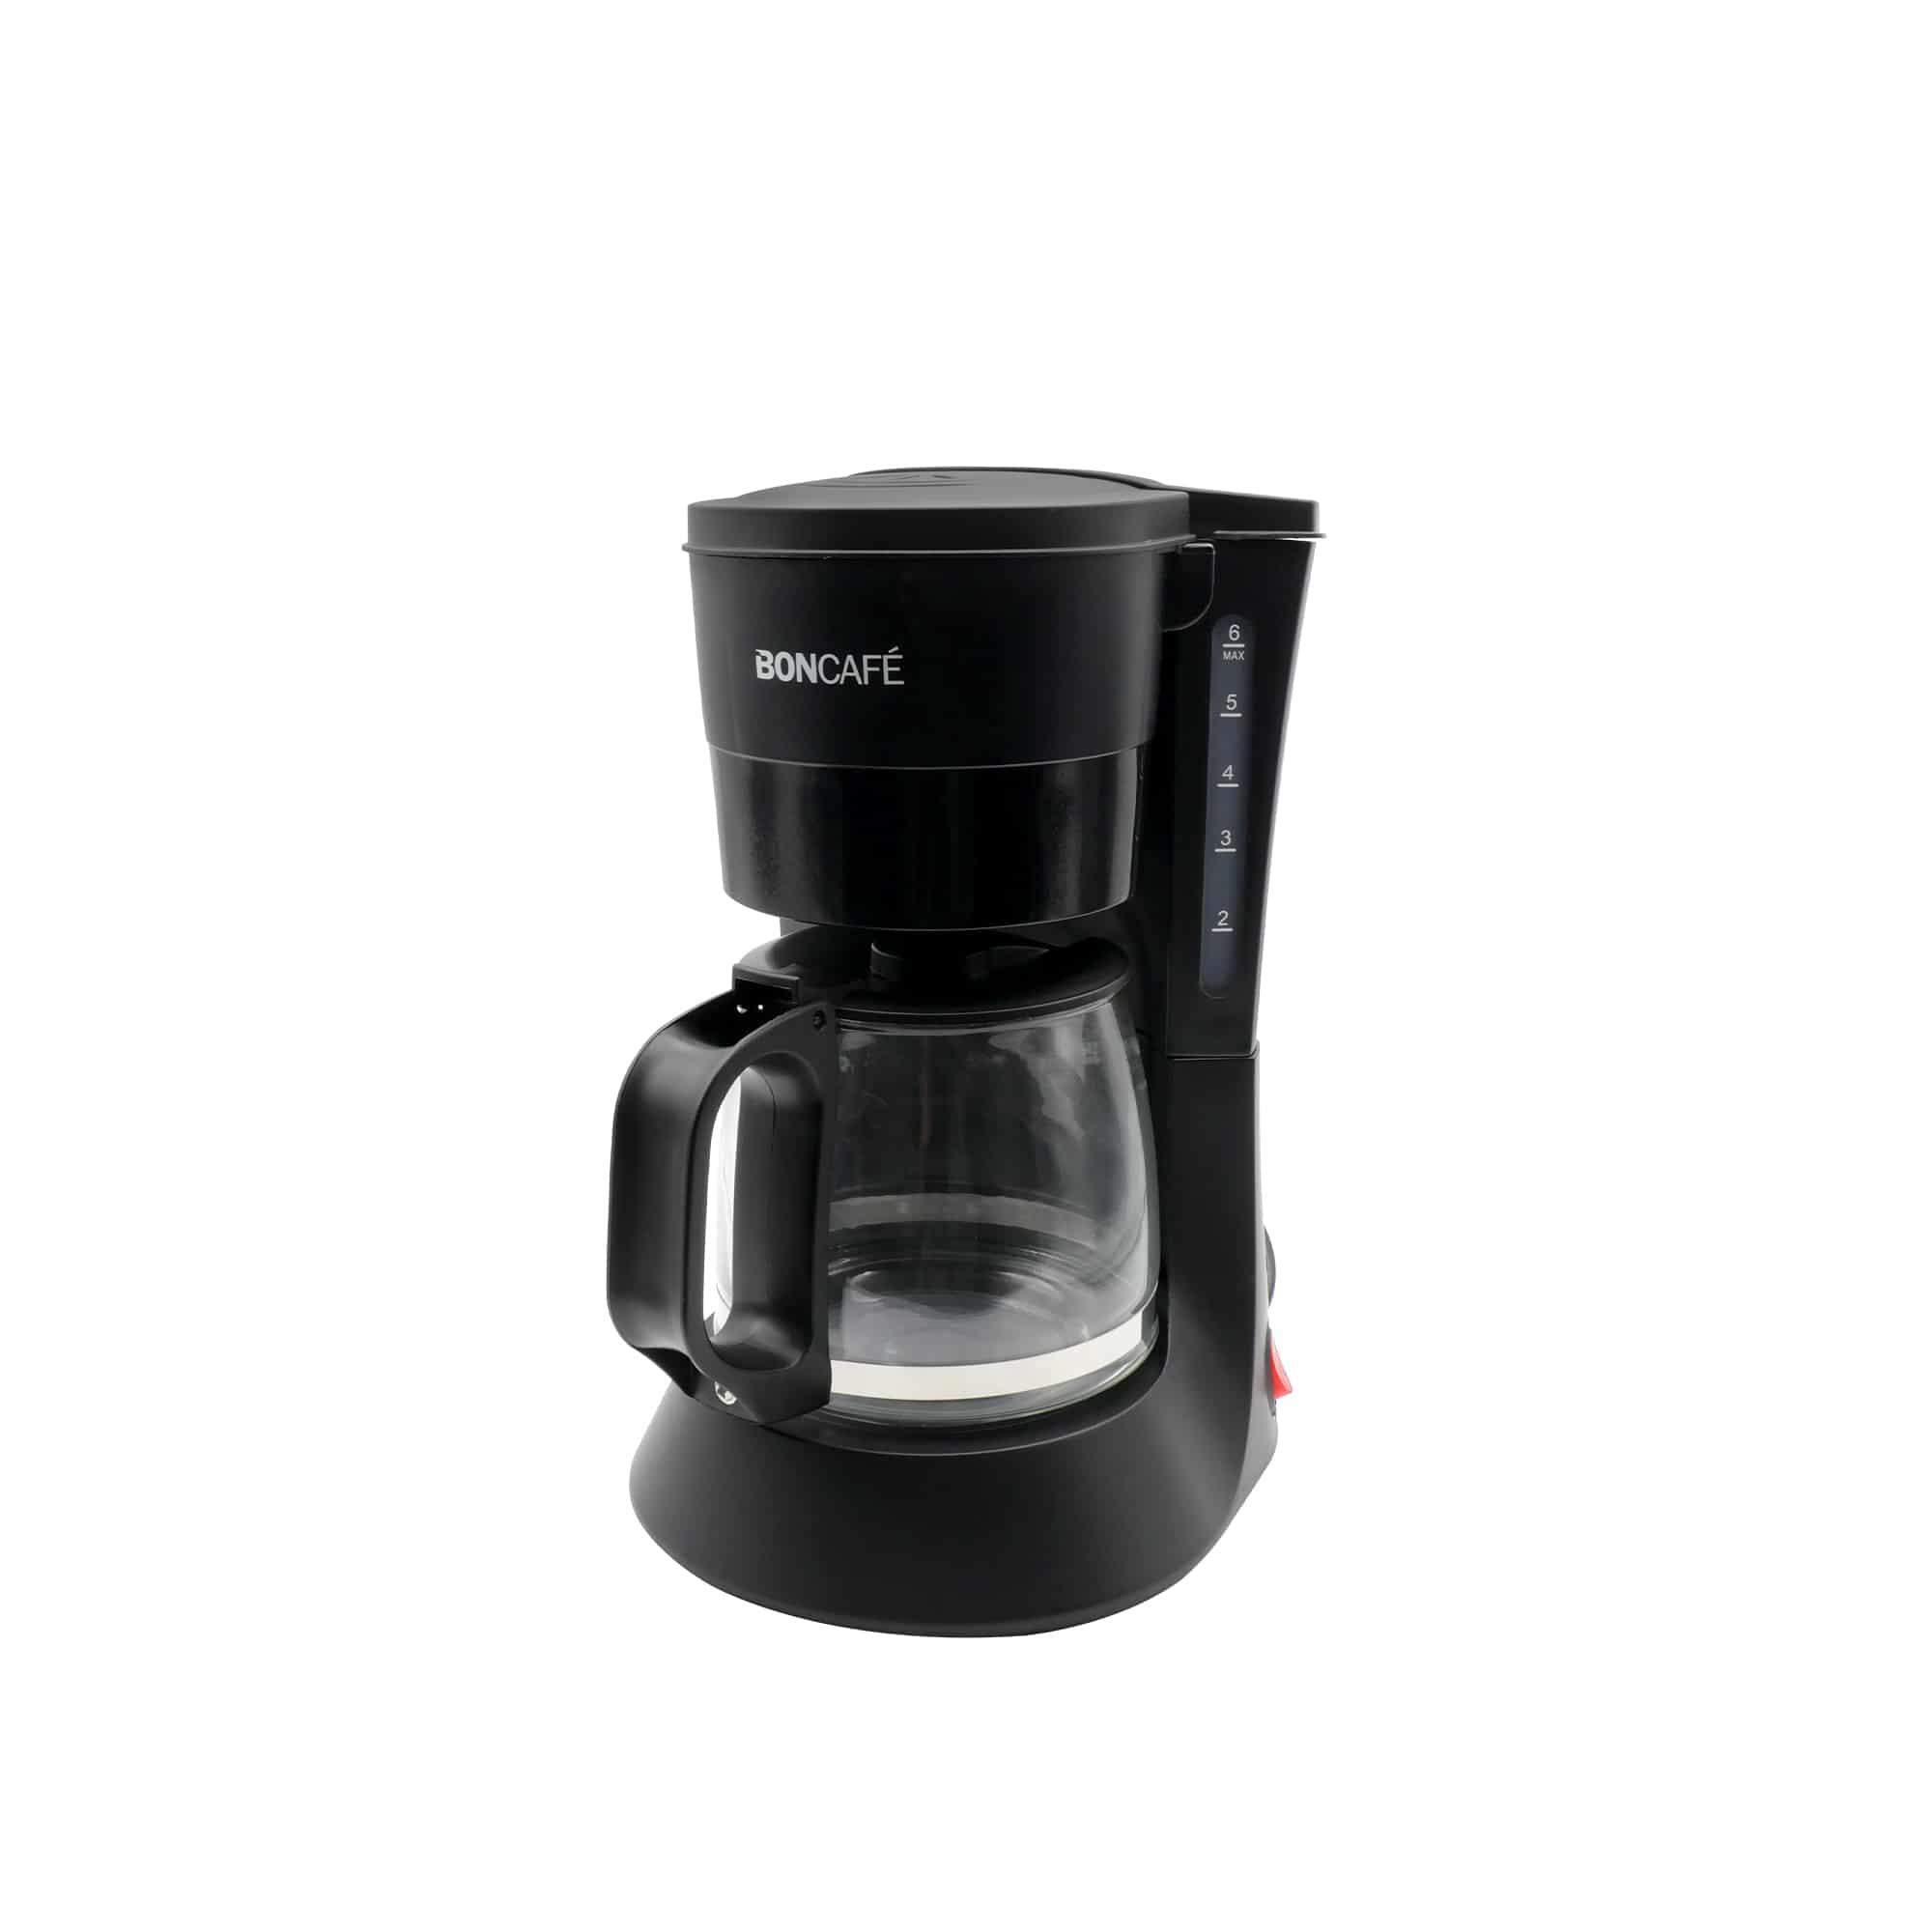 Boncafe-Drip-Coffee-Maker-2